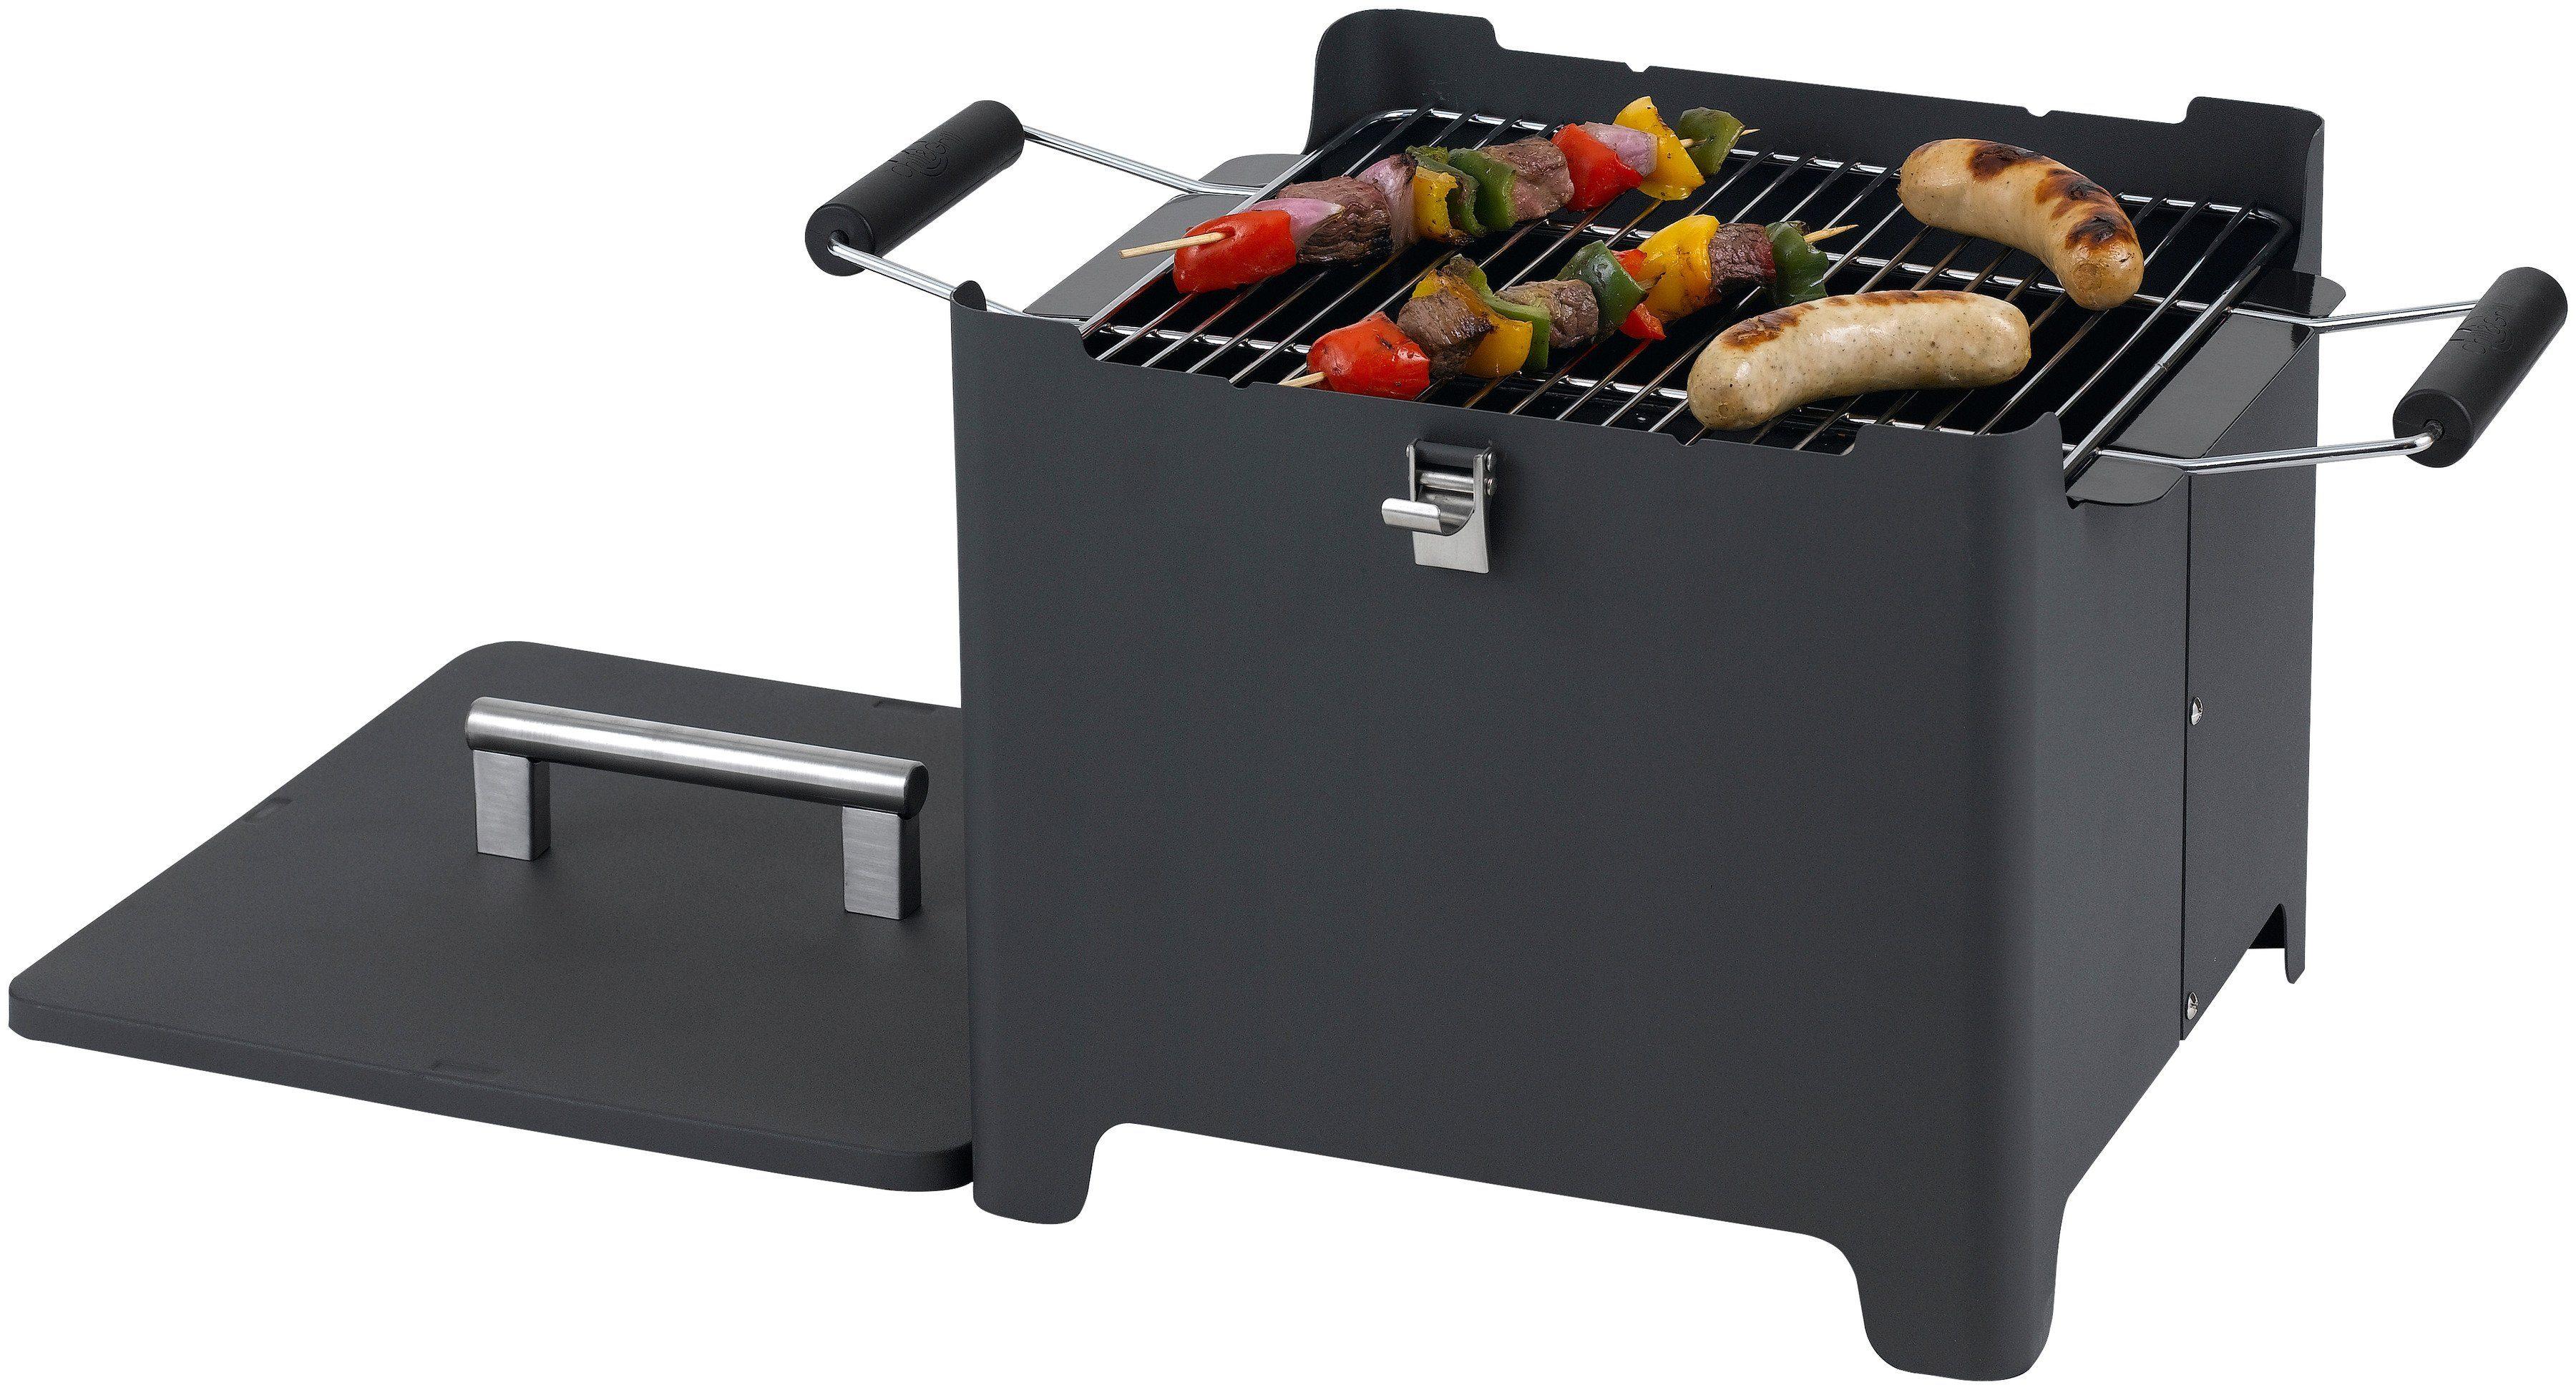 Tepro Toronto Holzkohlegrill Maße : Ollis grillabenteuer test tepro toronto grillwagen